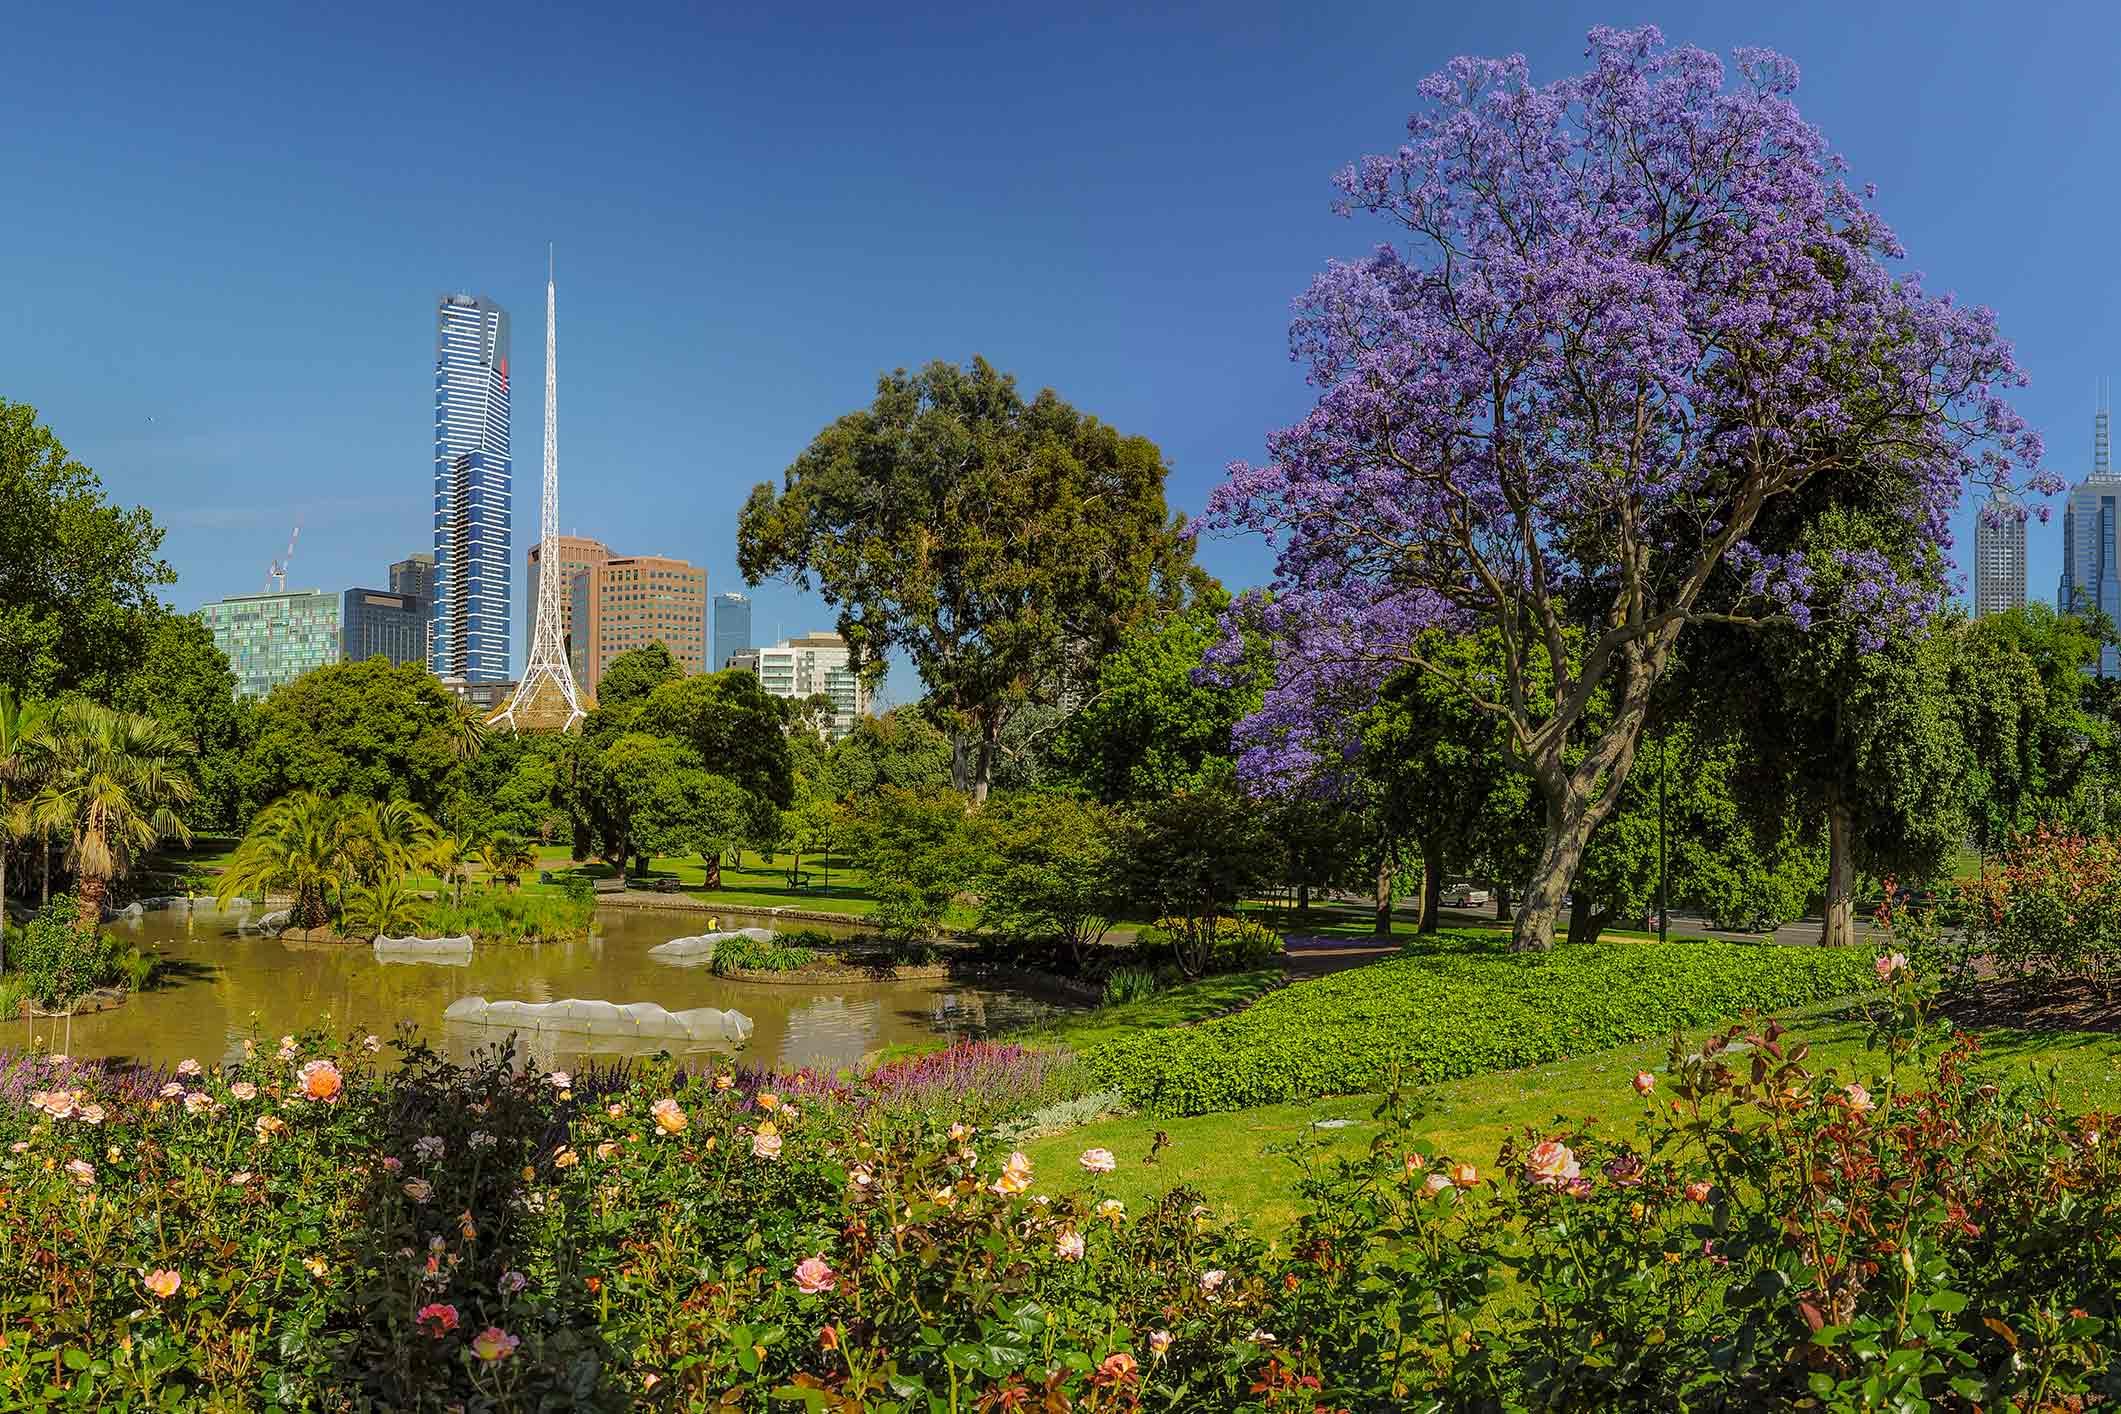 Royal Botanical Garden in Melbourne. Australia